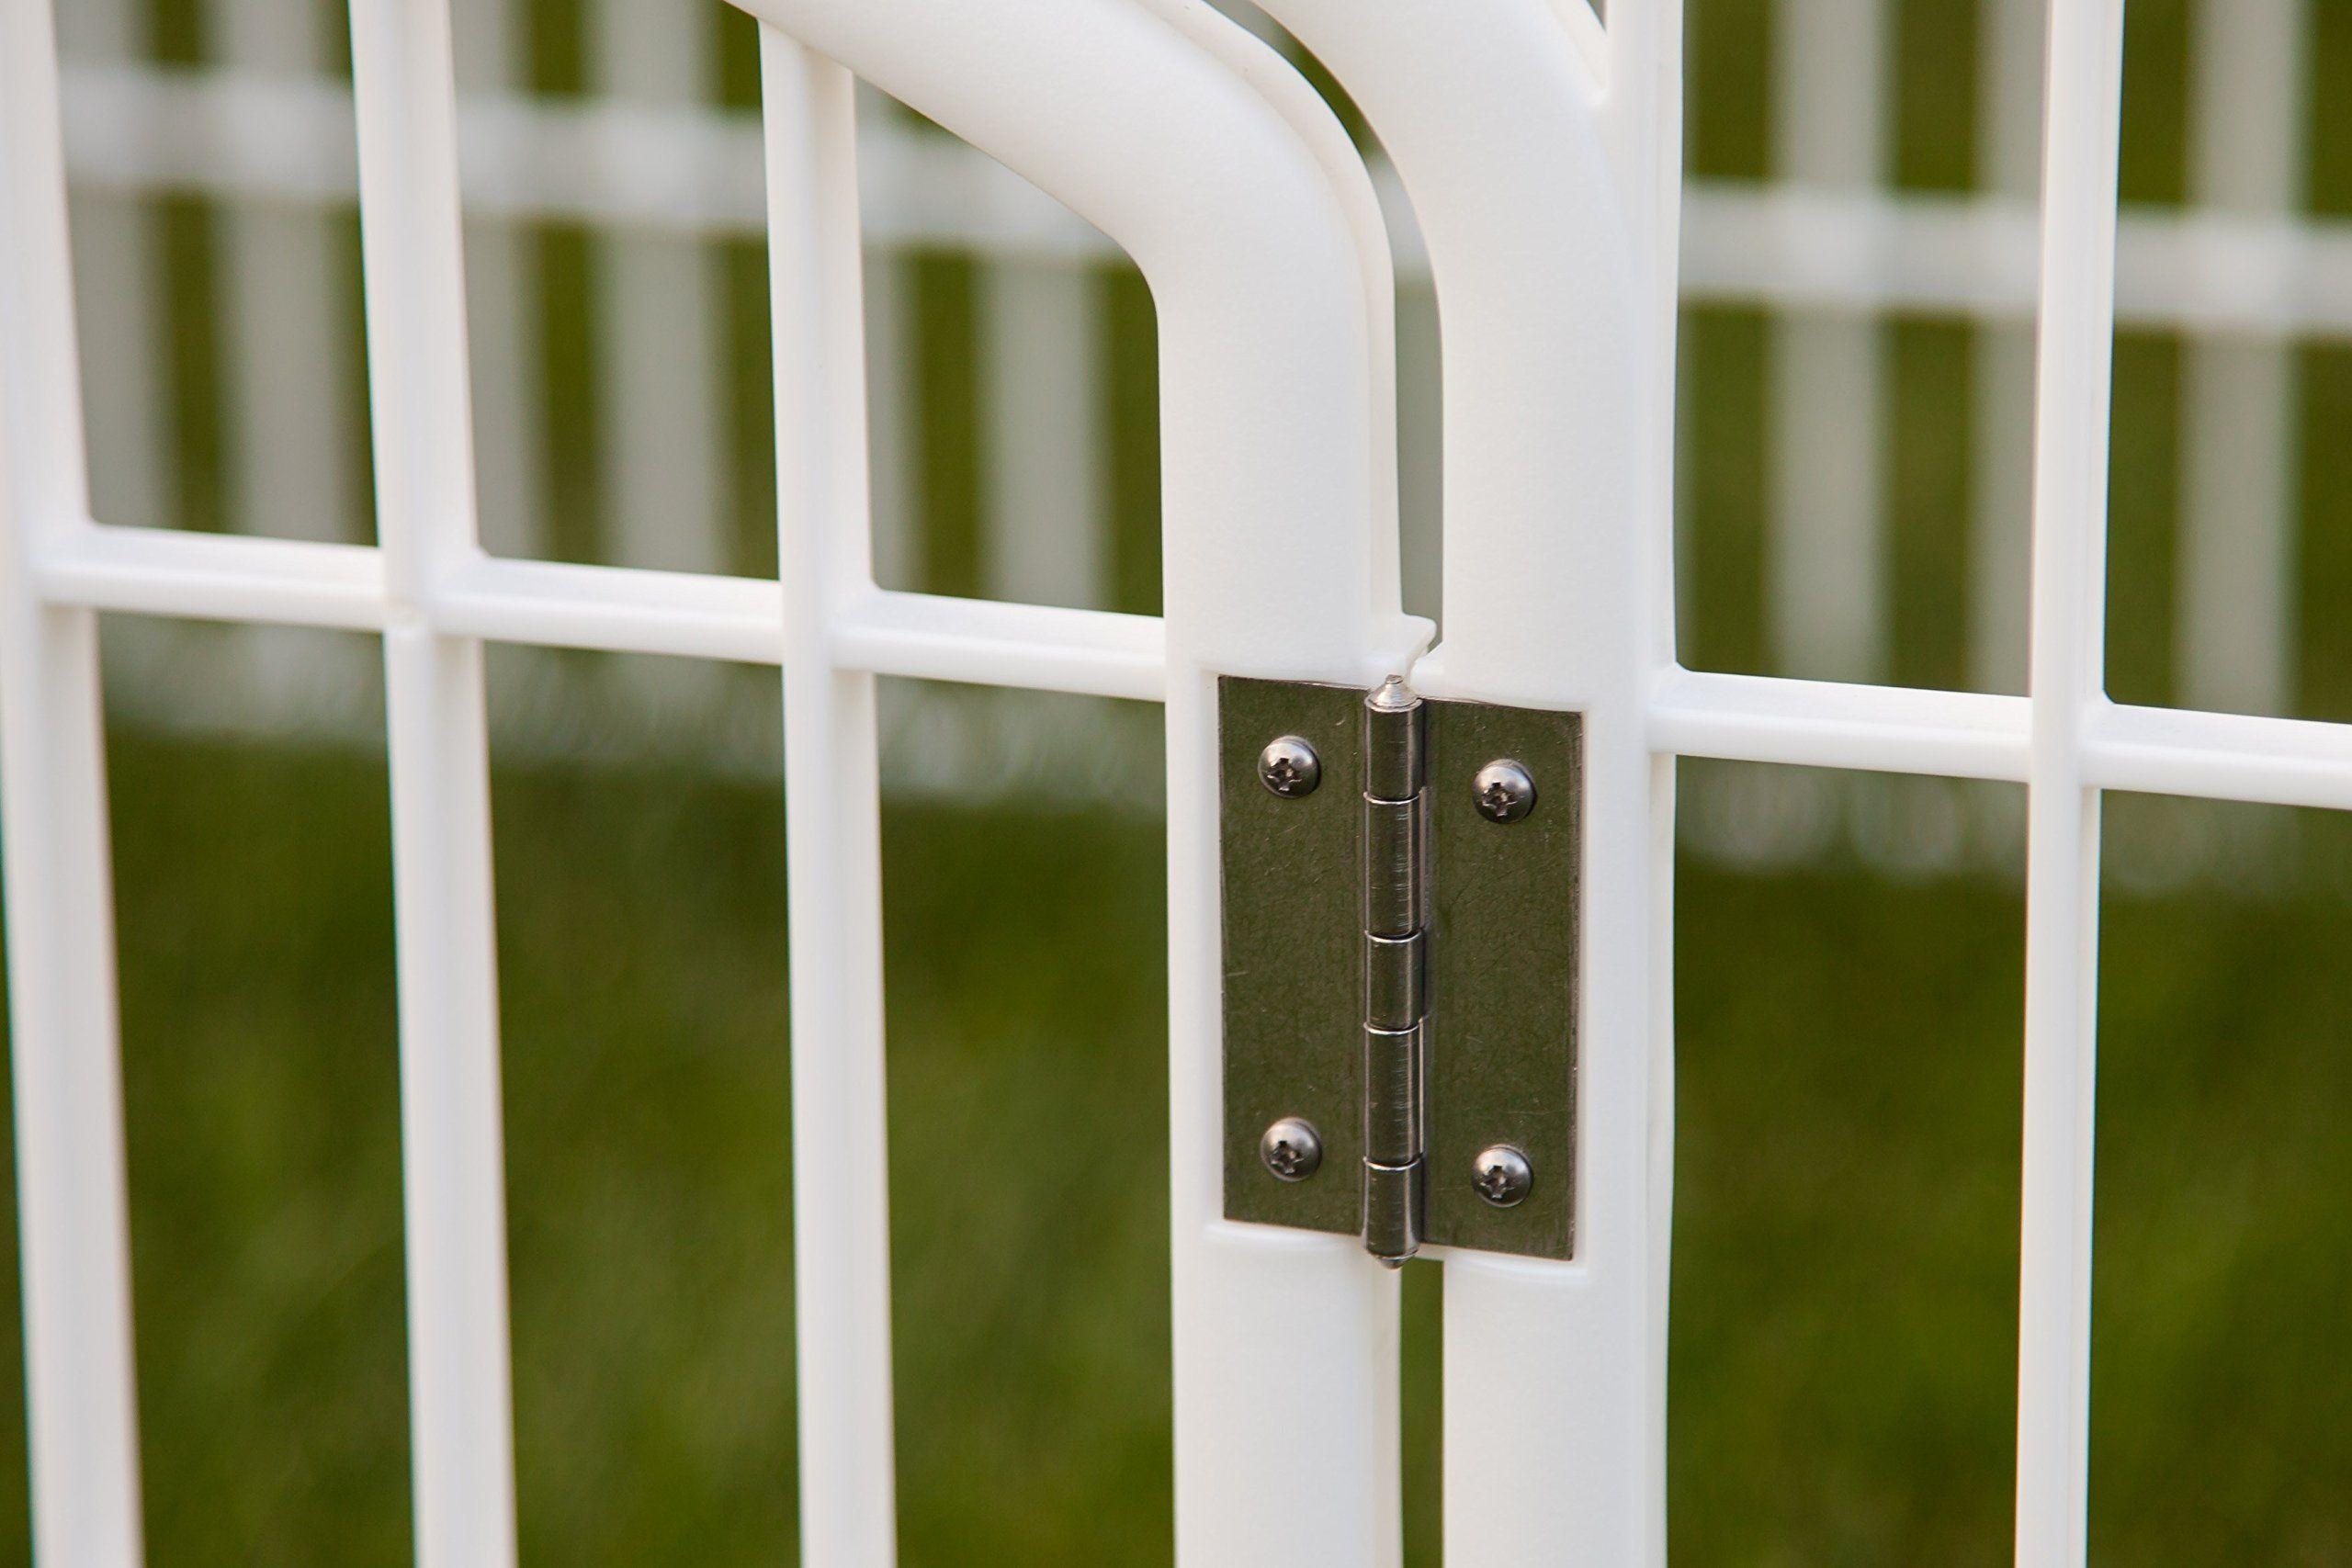 Iris 24 4panel Pet Playpen With Door Details Can Be Found By